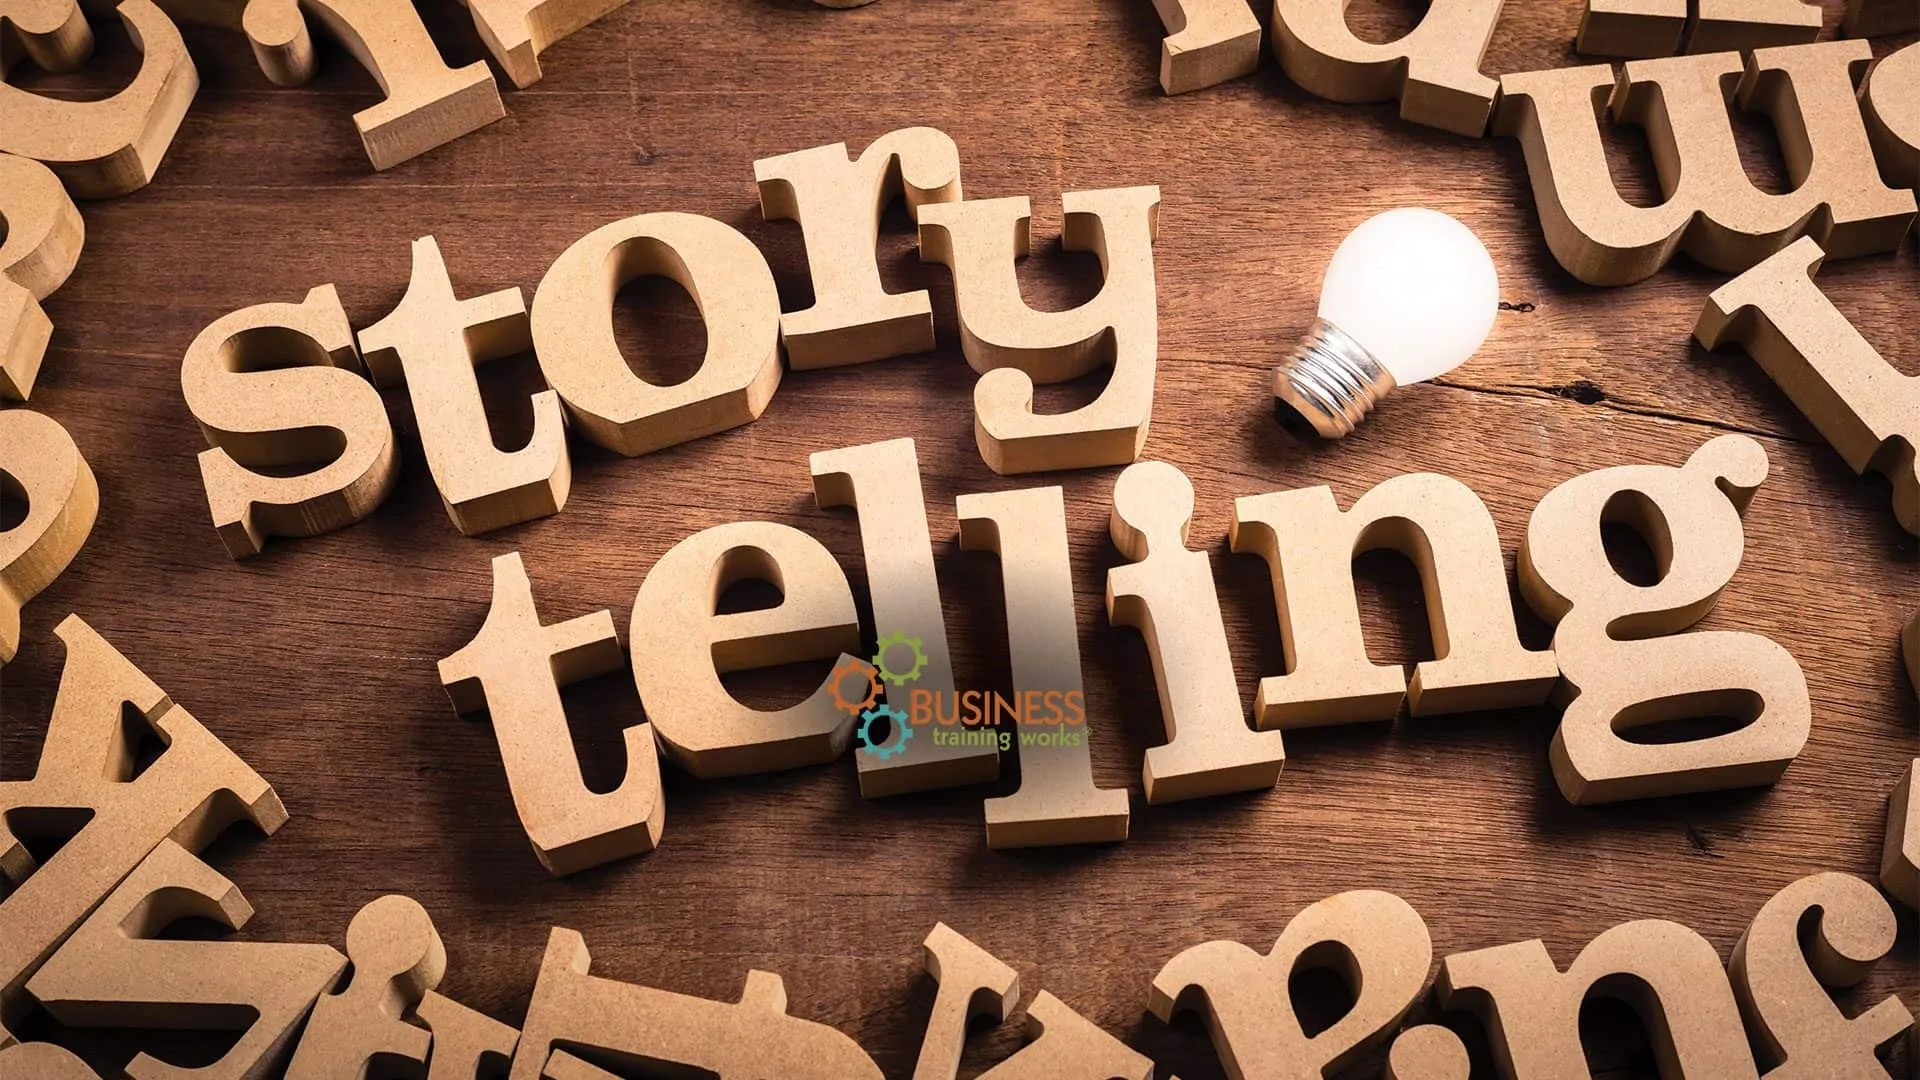 Storytelling Training Courses and Workshops